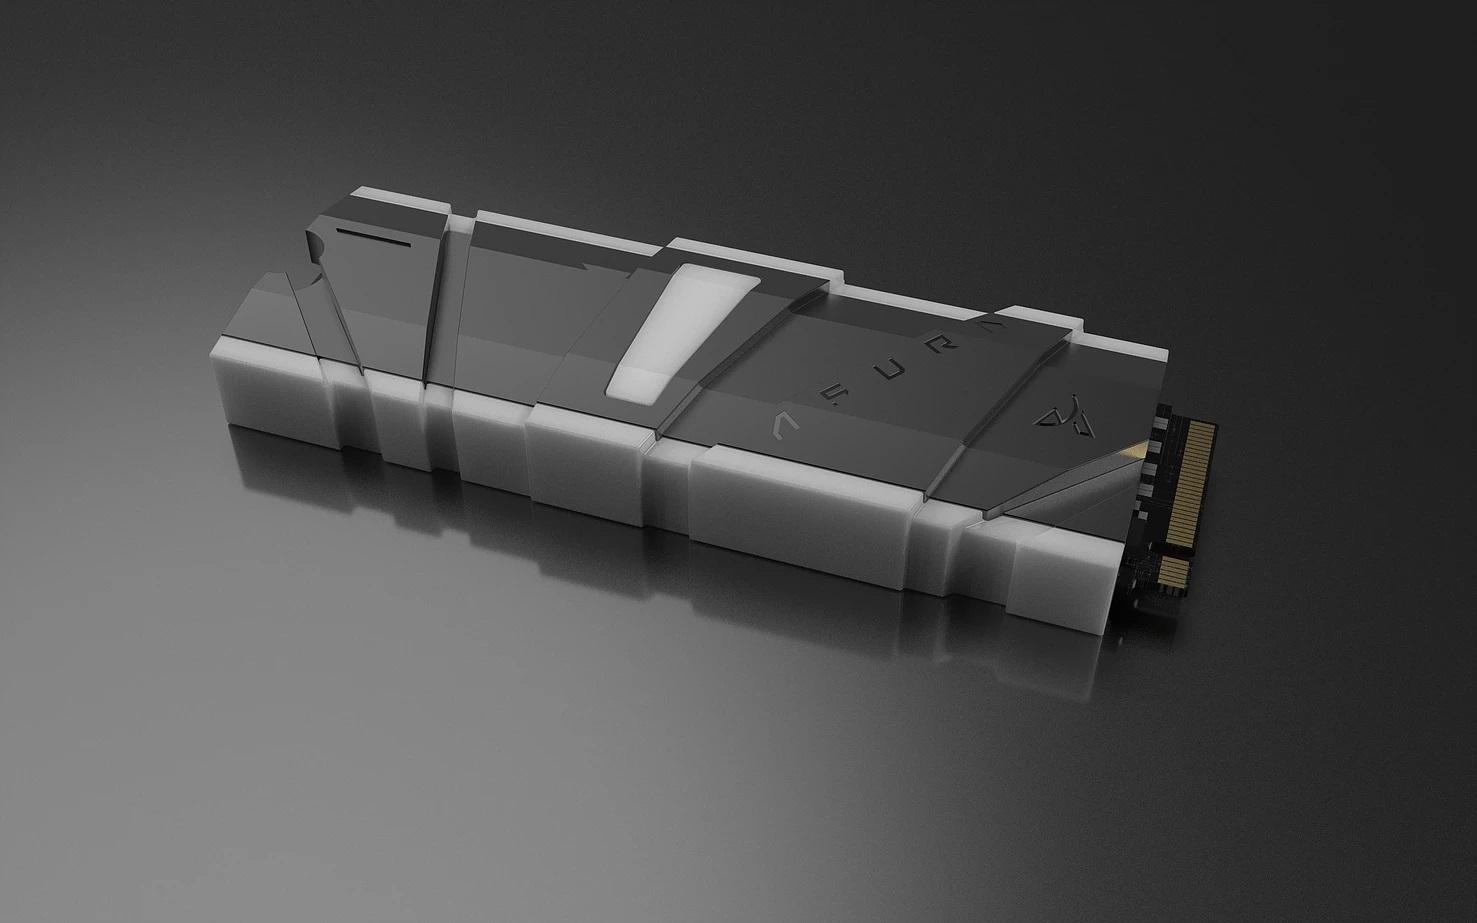 Asura Genesis Xtreme High Performance 1TB Gaming PCIe Gen 3.0 x4 3D TLC NVMe M.2